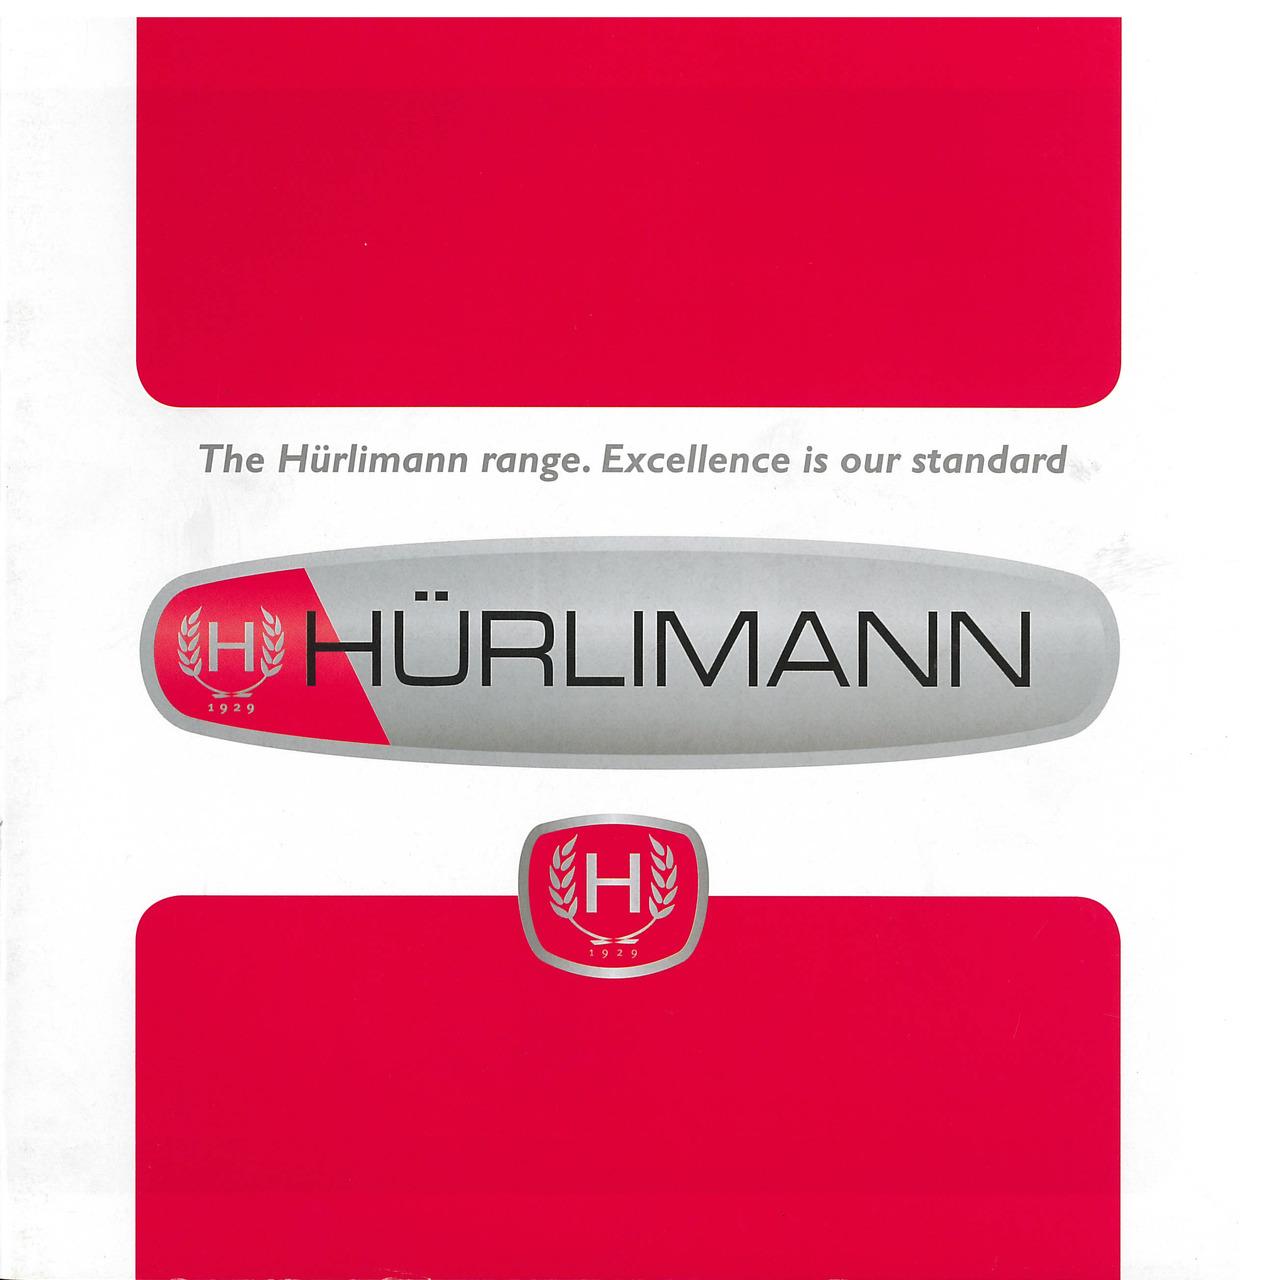 HURLIMANN - The Hurlimann range. Excellence is our standard